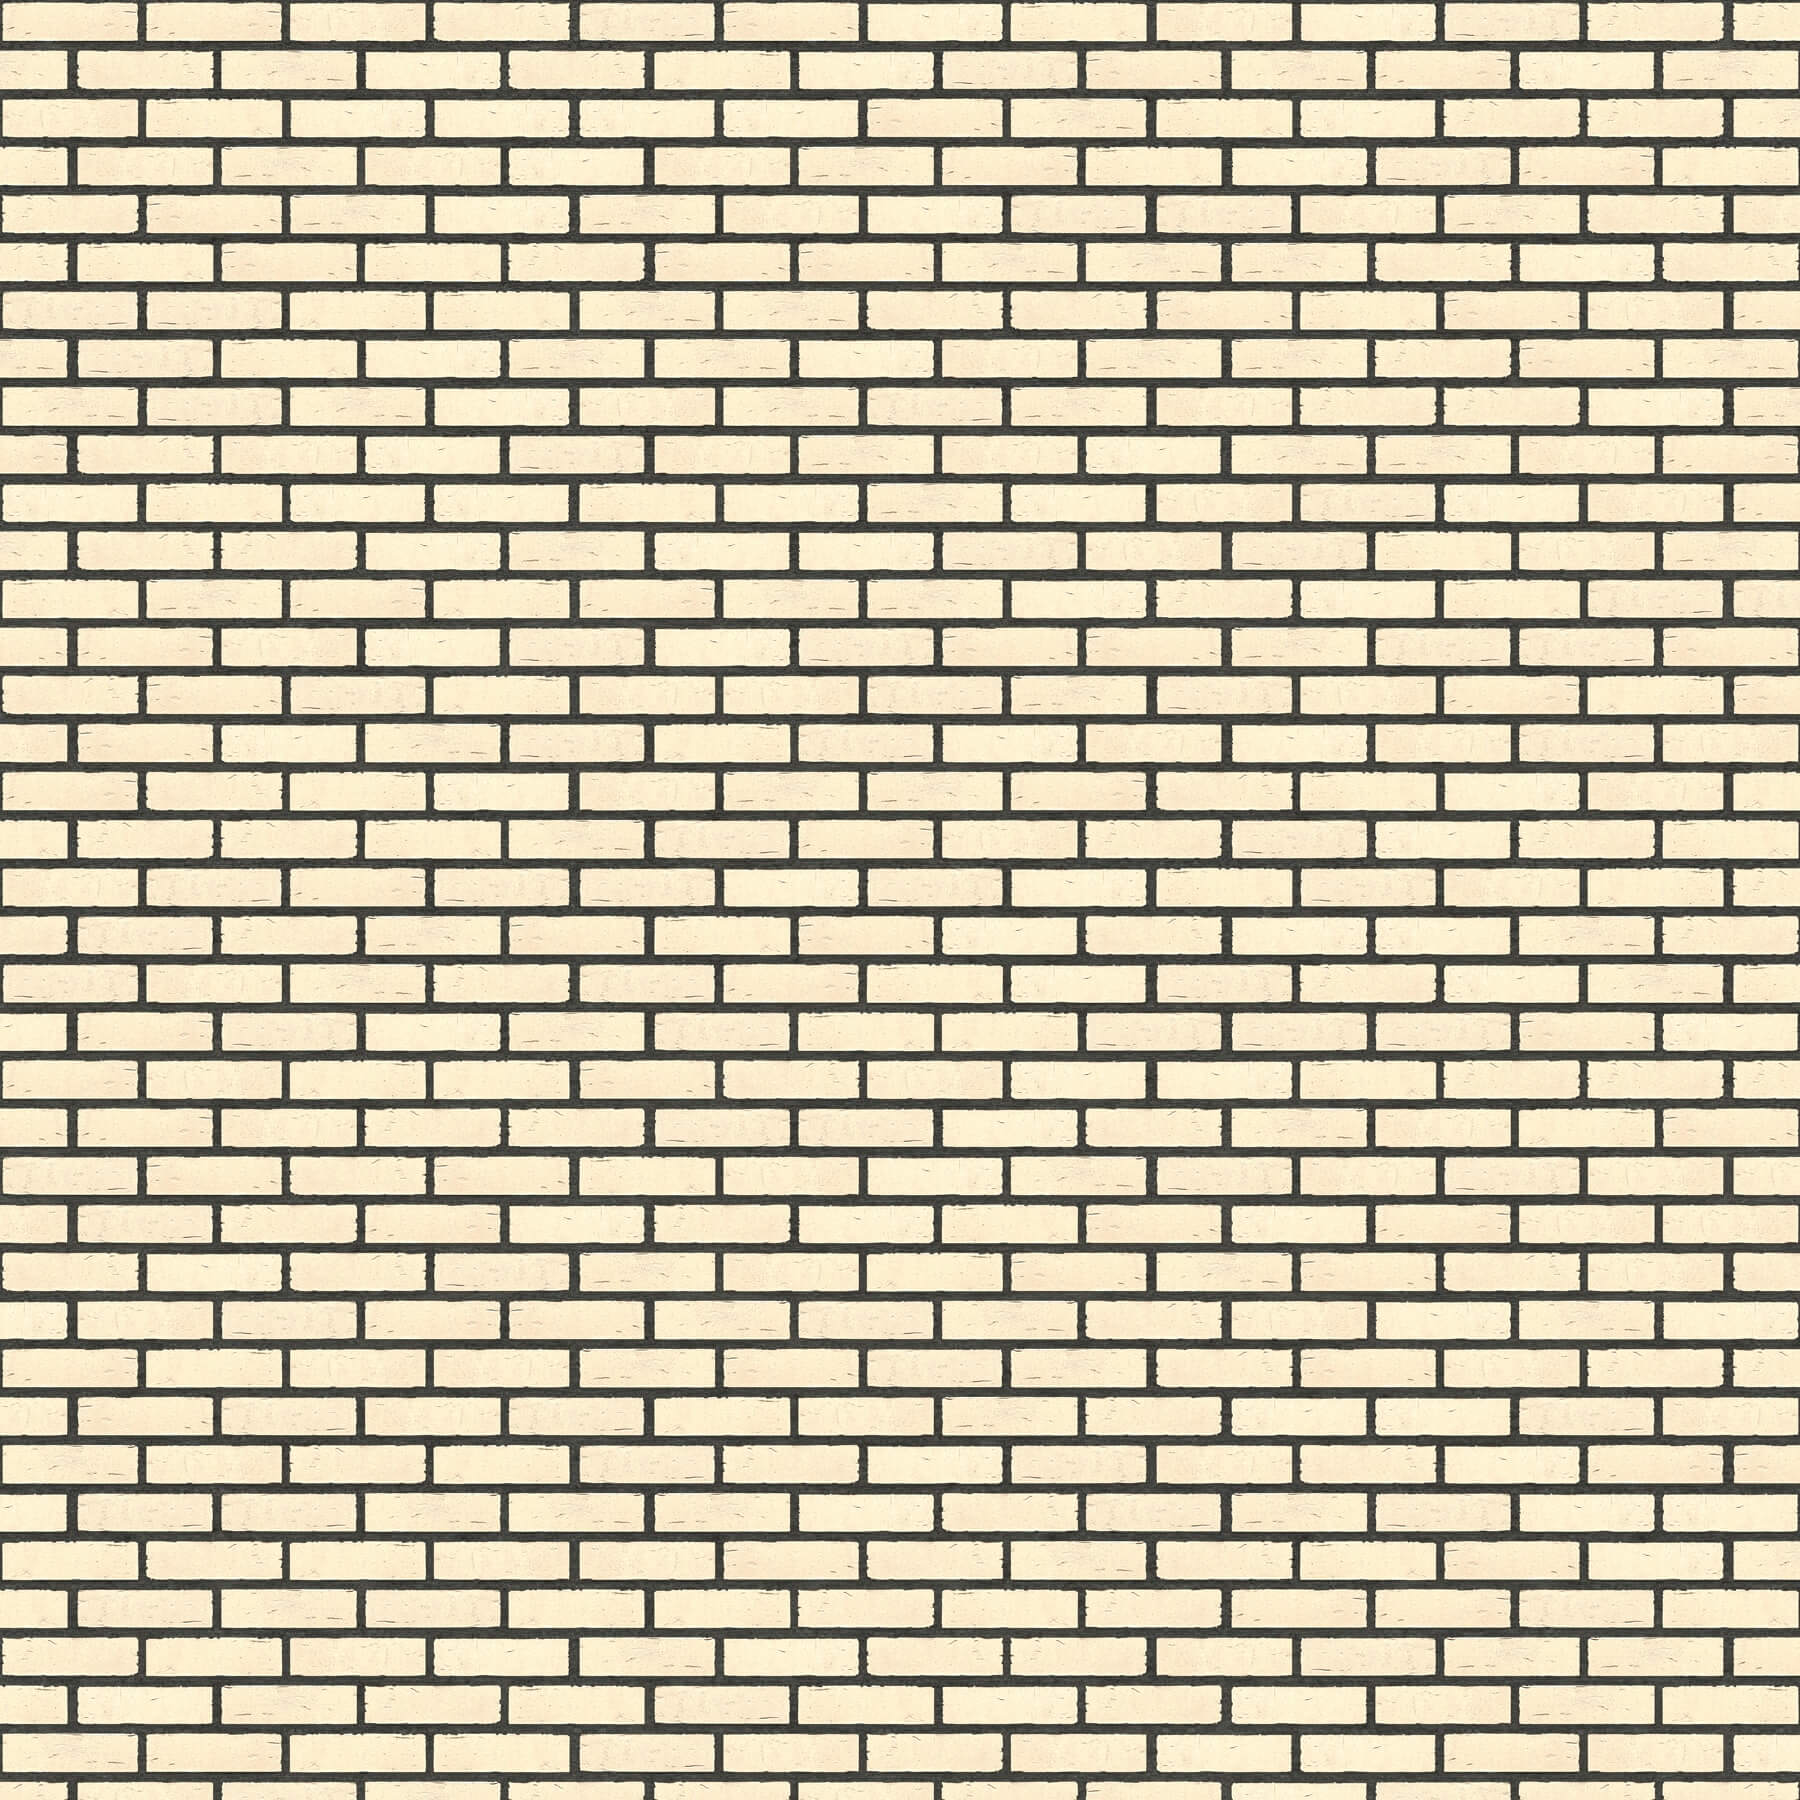 Dekorativna cigla listela FeldHaus Klinker r-763 nf Antracit